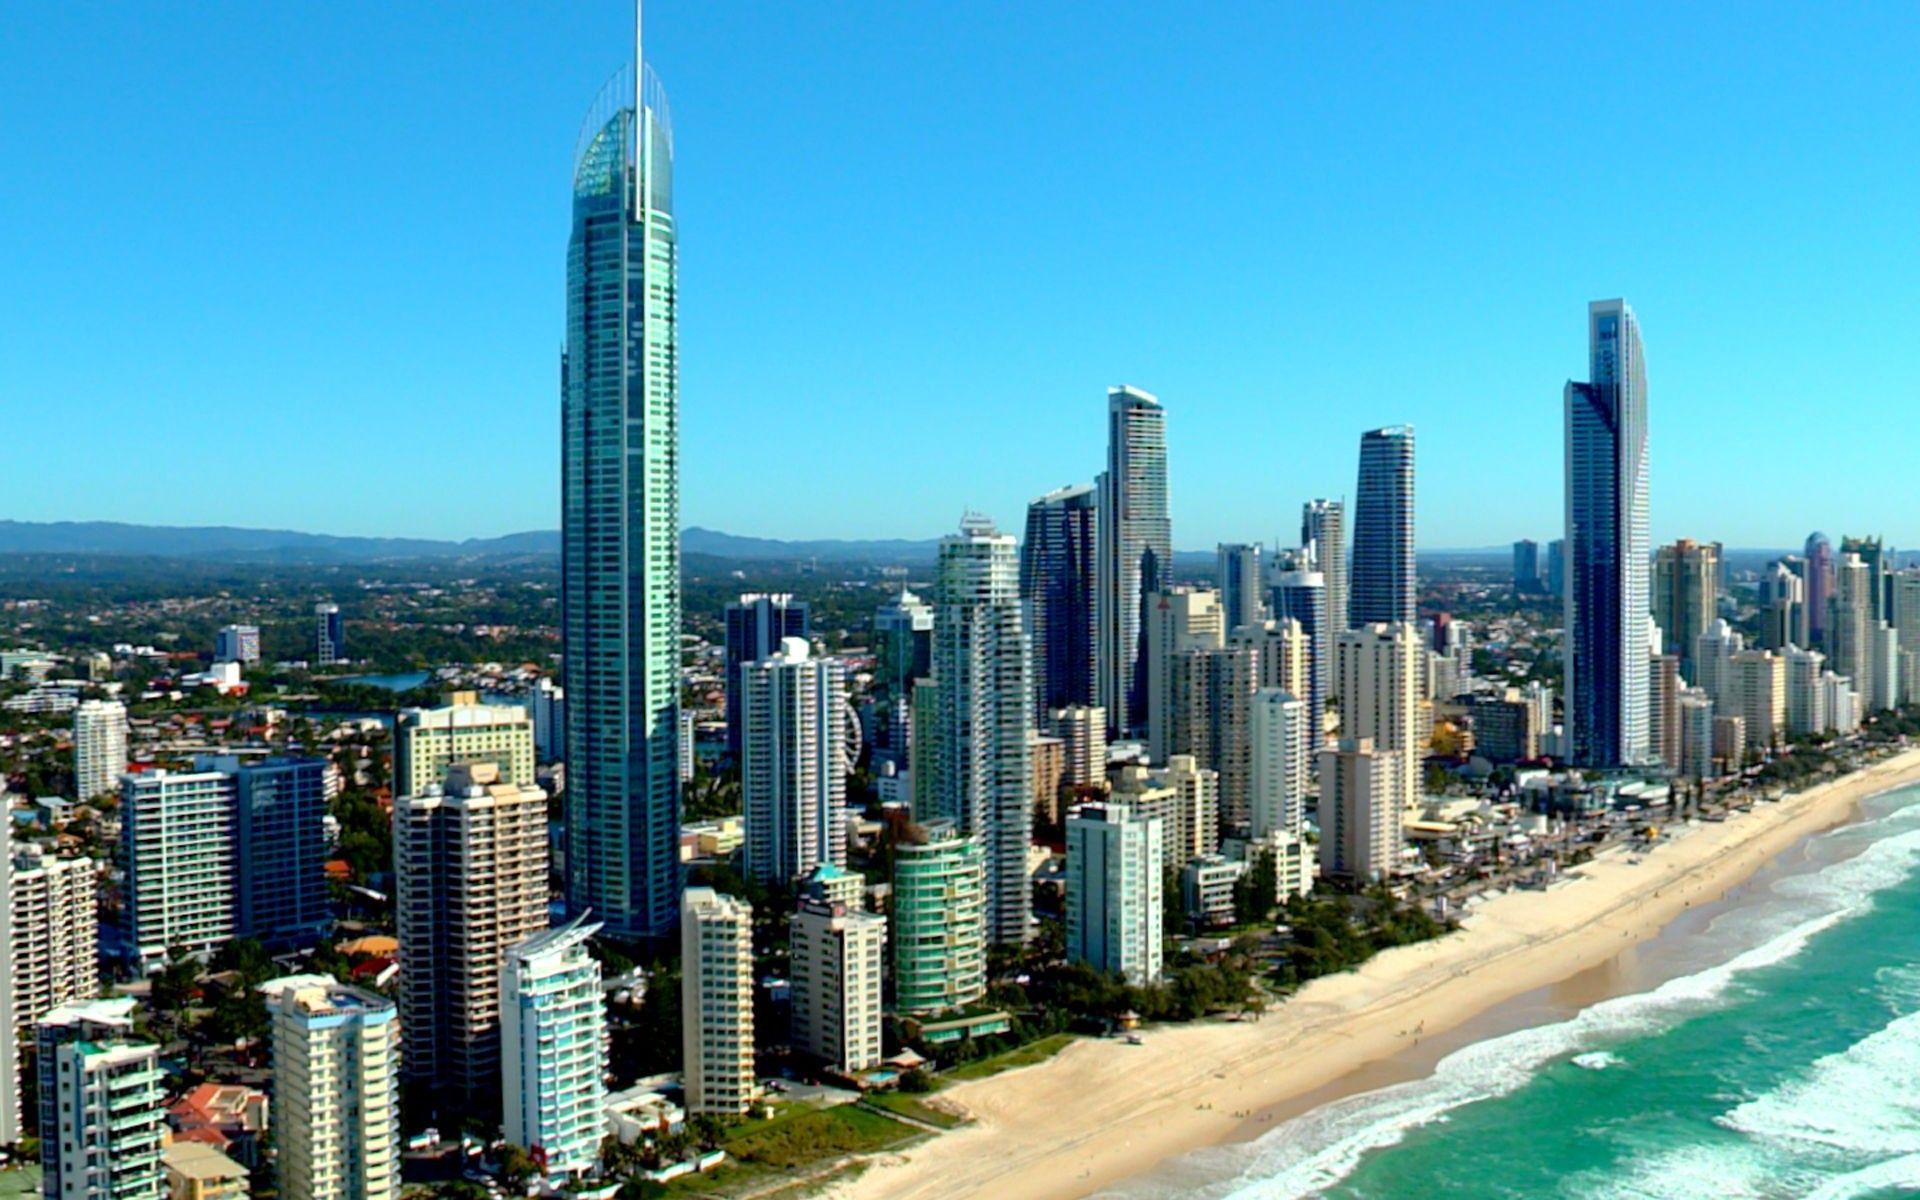 Gold Coast Coastal City Queensland Australia Hd Wallpaper Coastal Cities Gold Coast Queensland Australia